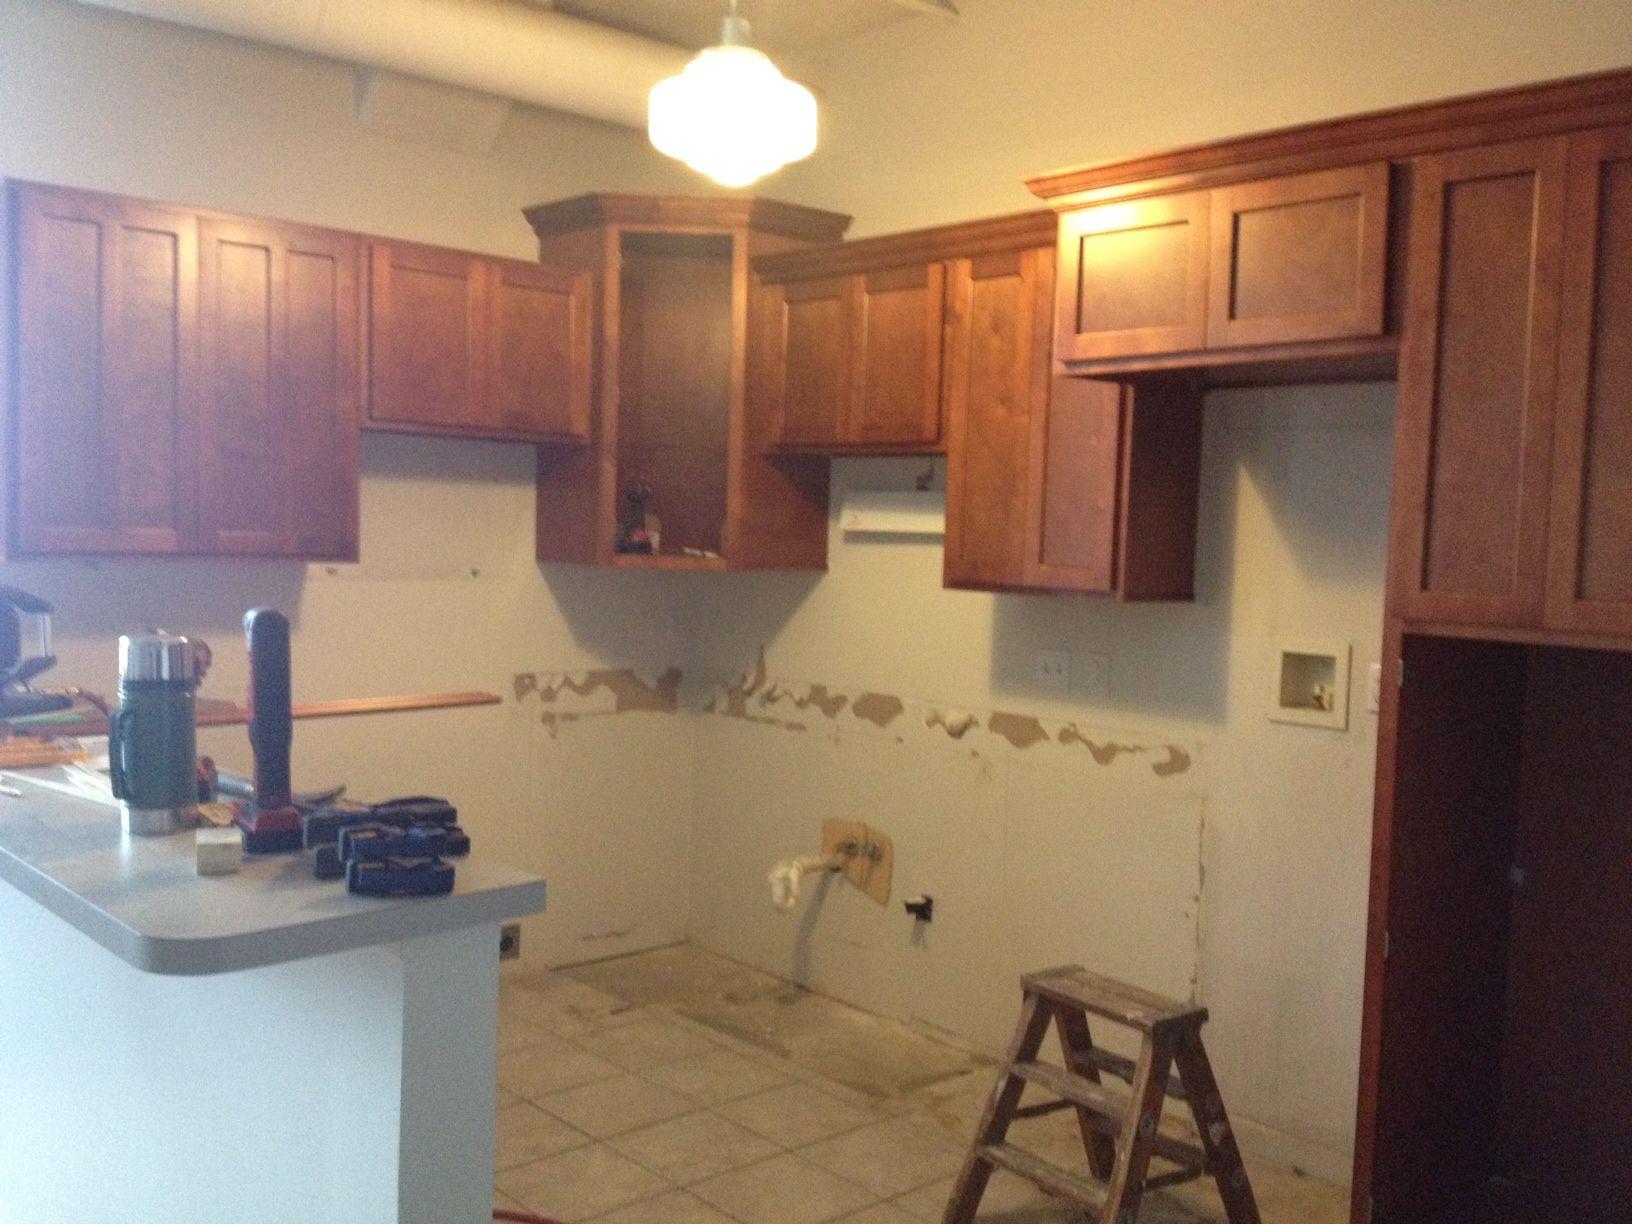 New beautiful cabinetry set installation #BridgeviewApartments